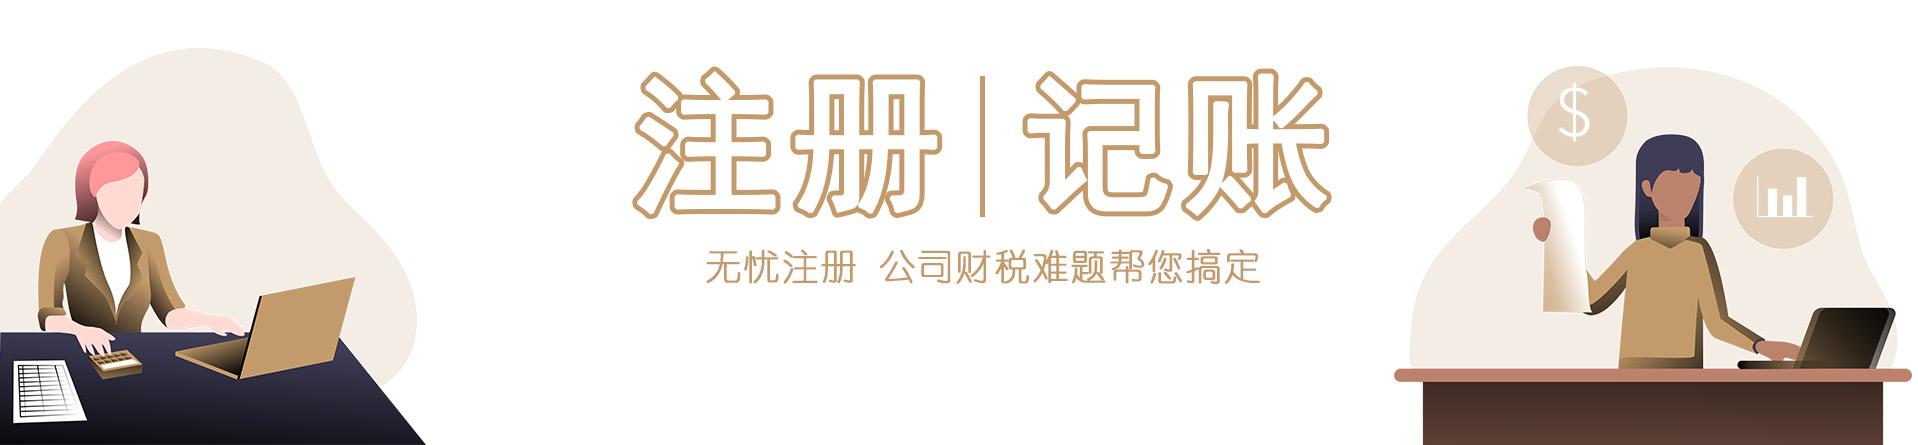 wuyou注册公司,财shui难题bang您搞定